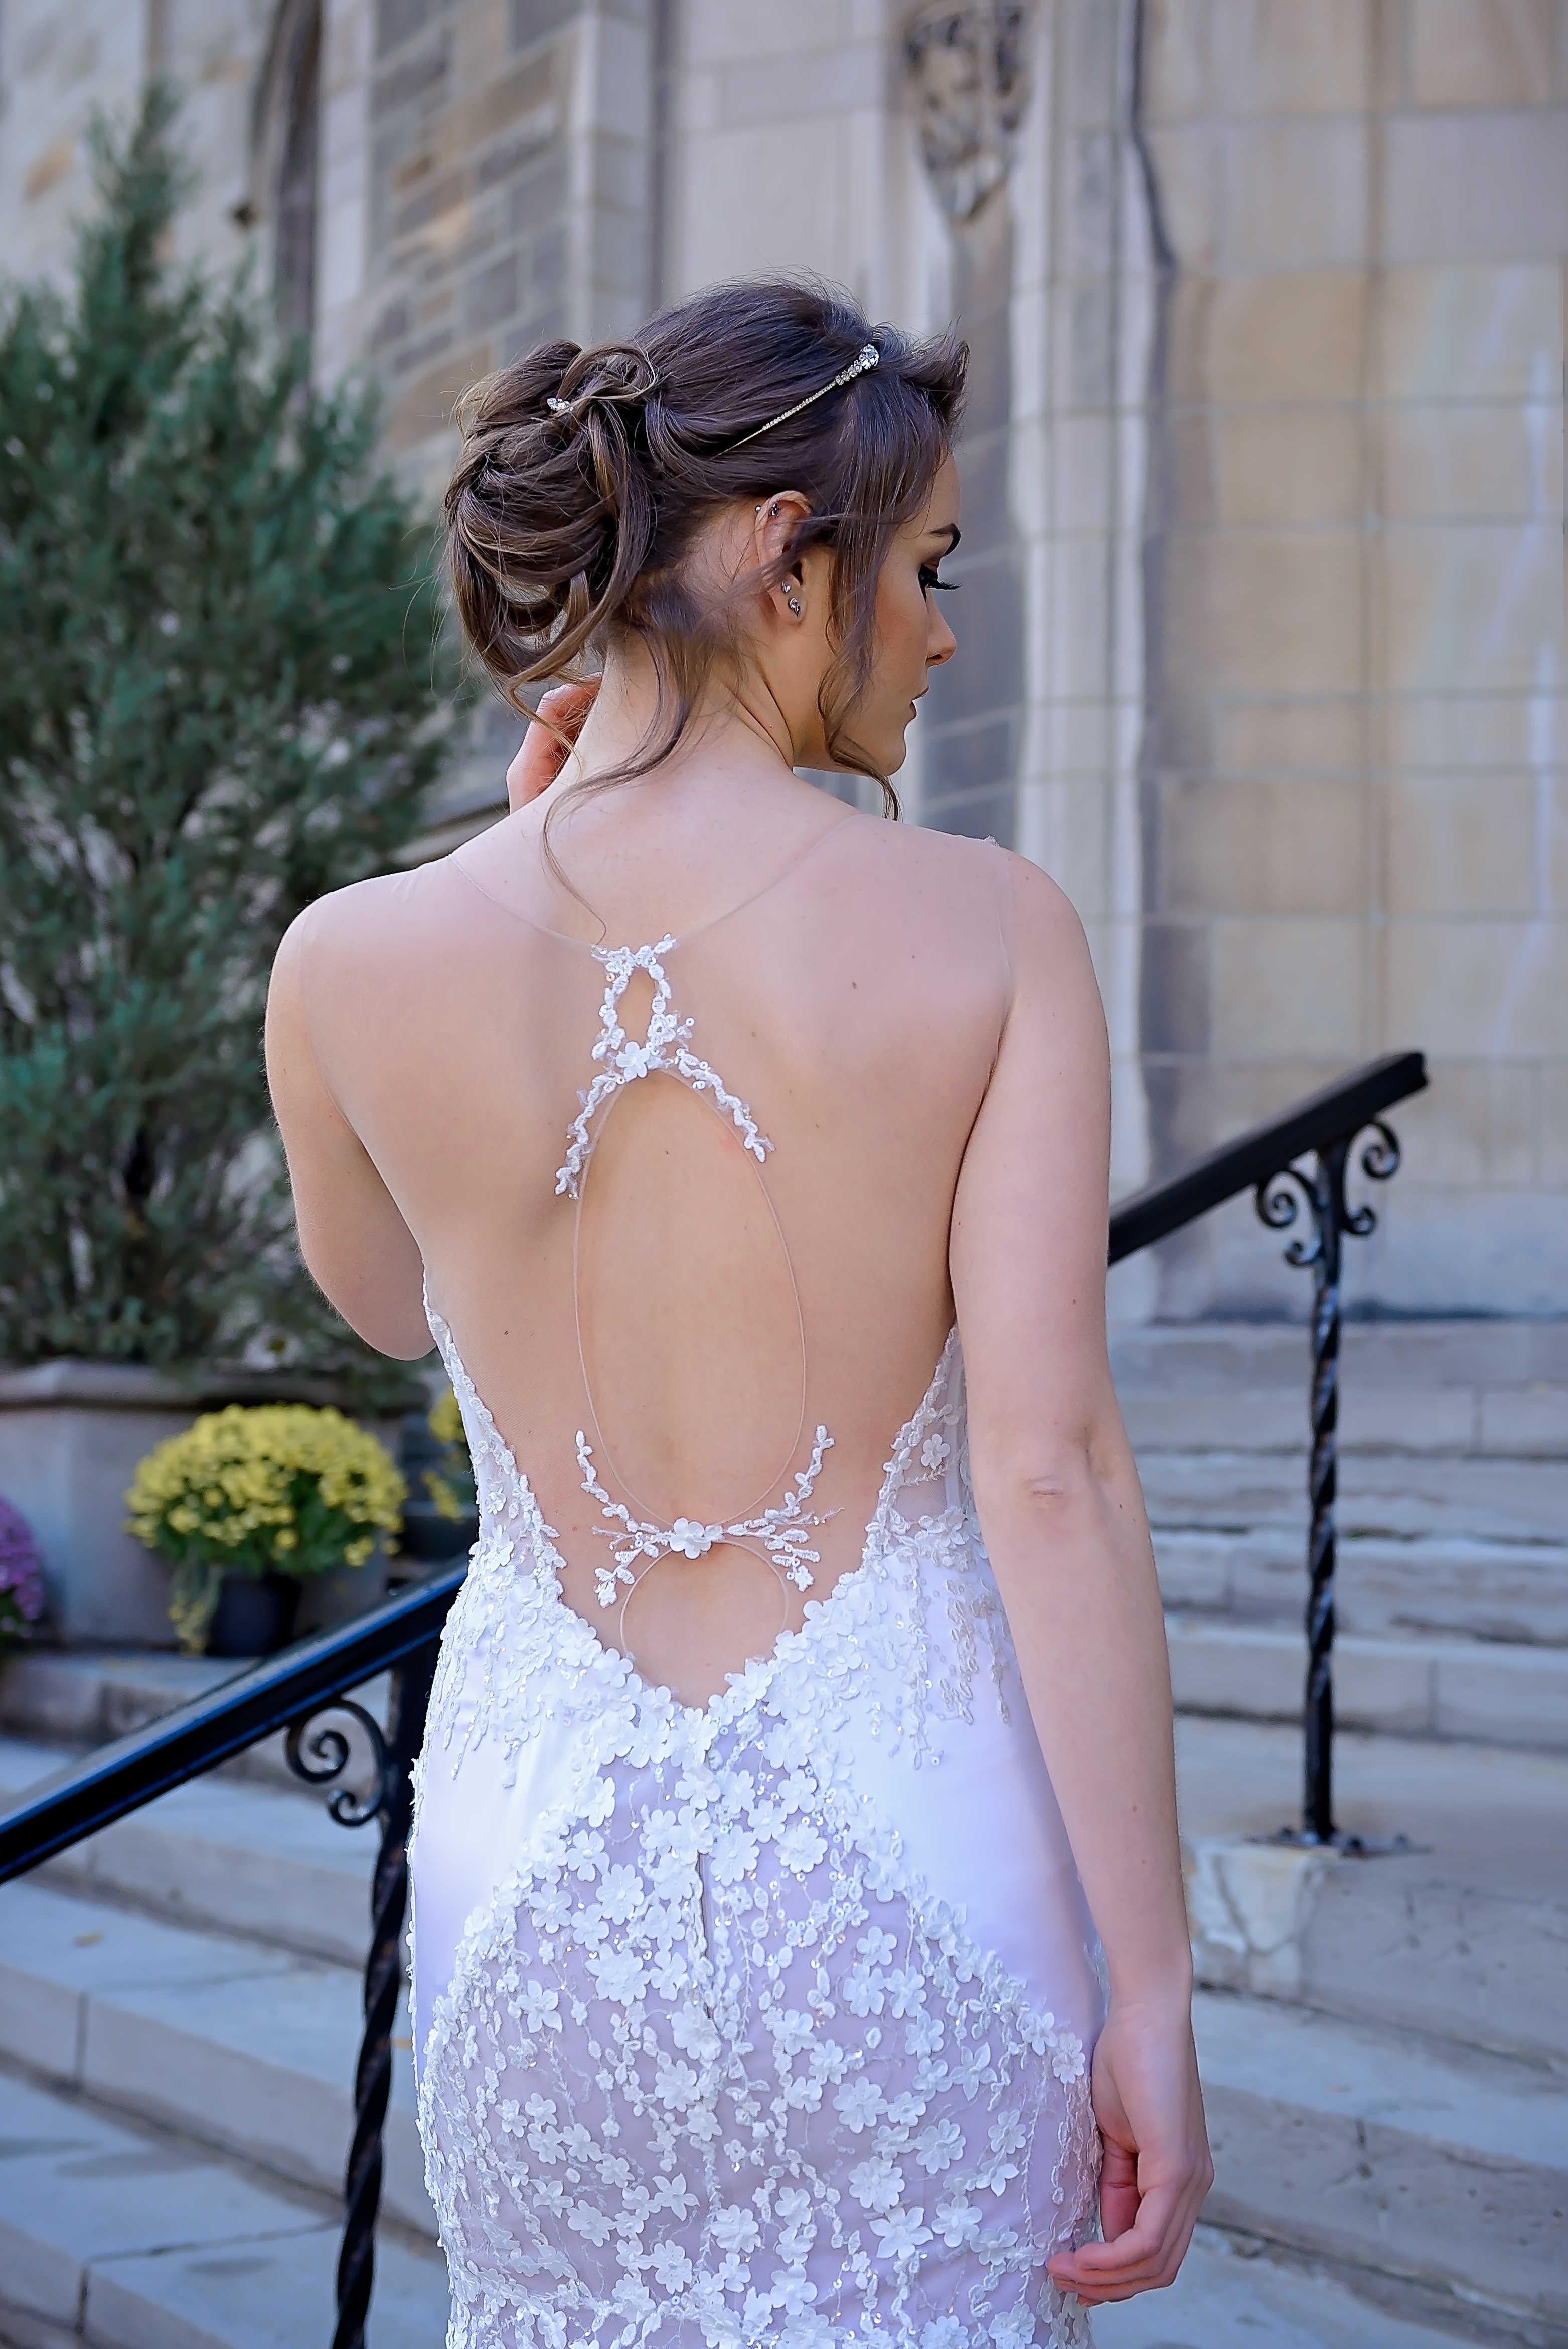 robes de mariee montreal lilia haute couture dos denude robe en dentelle florale